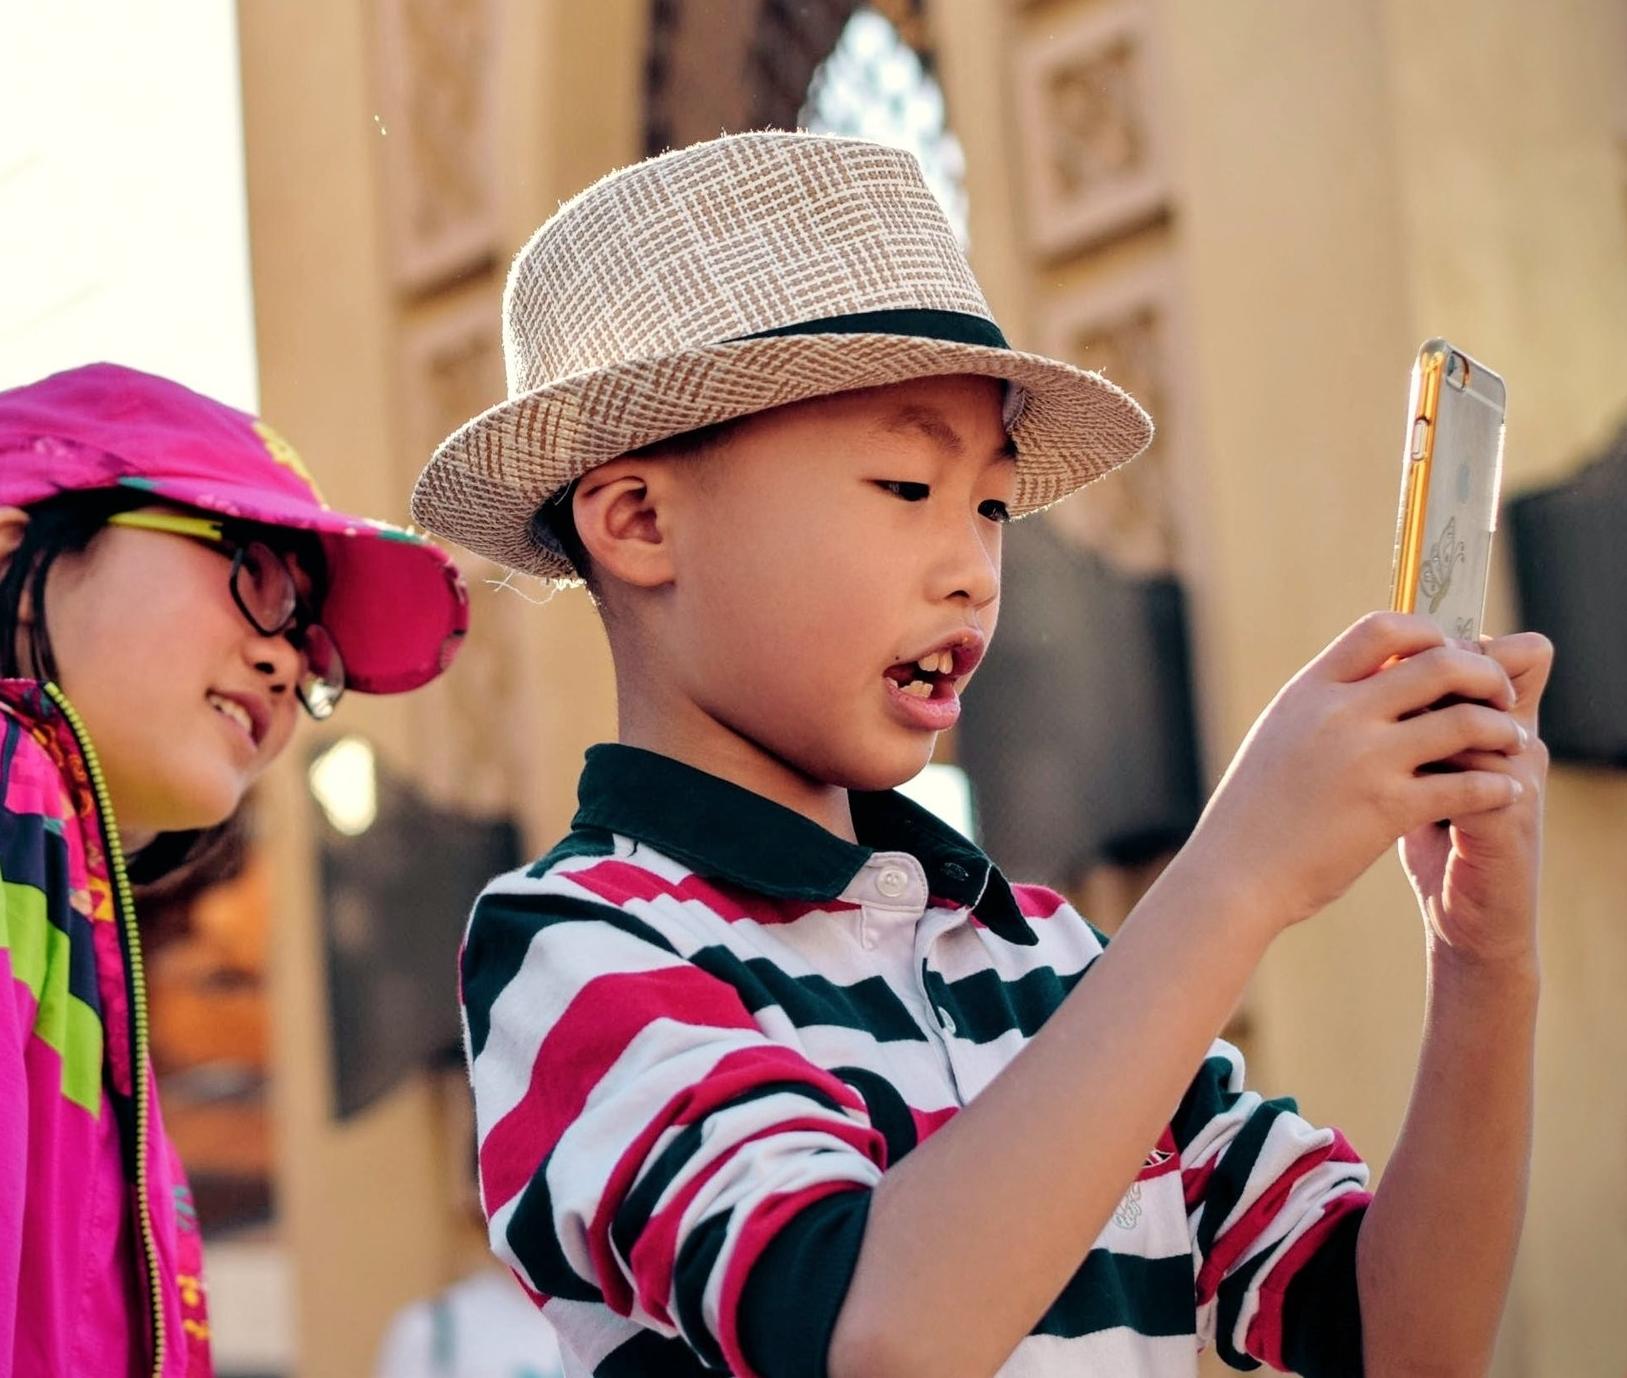 Asian boy with phone Pexels.jpg